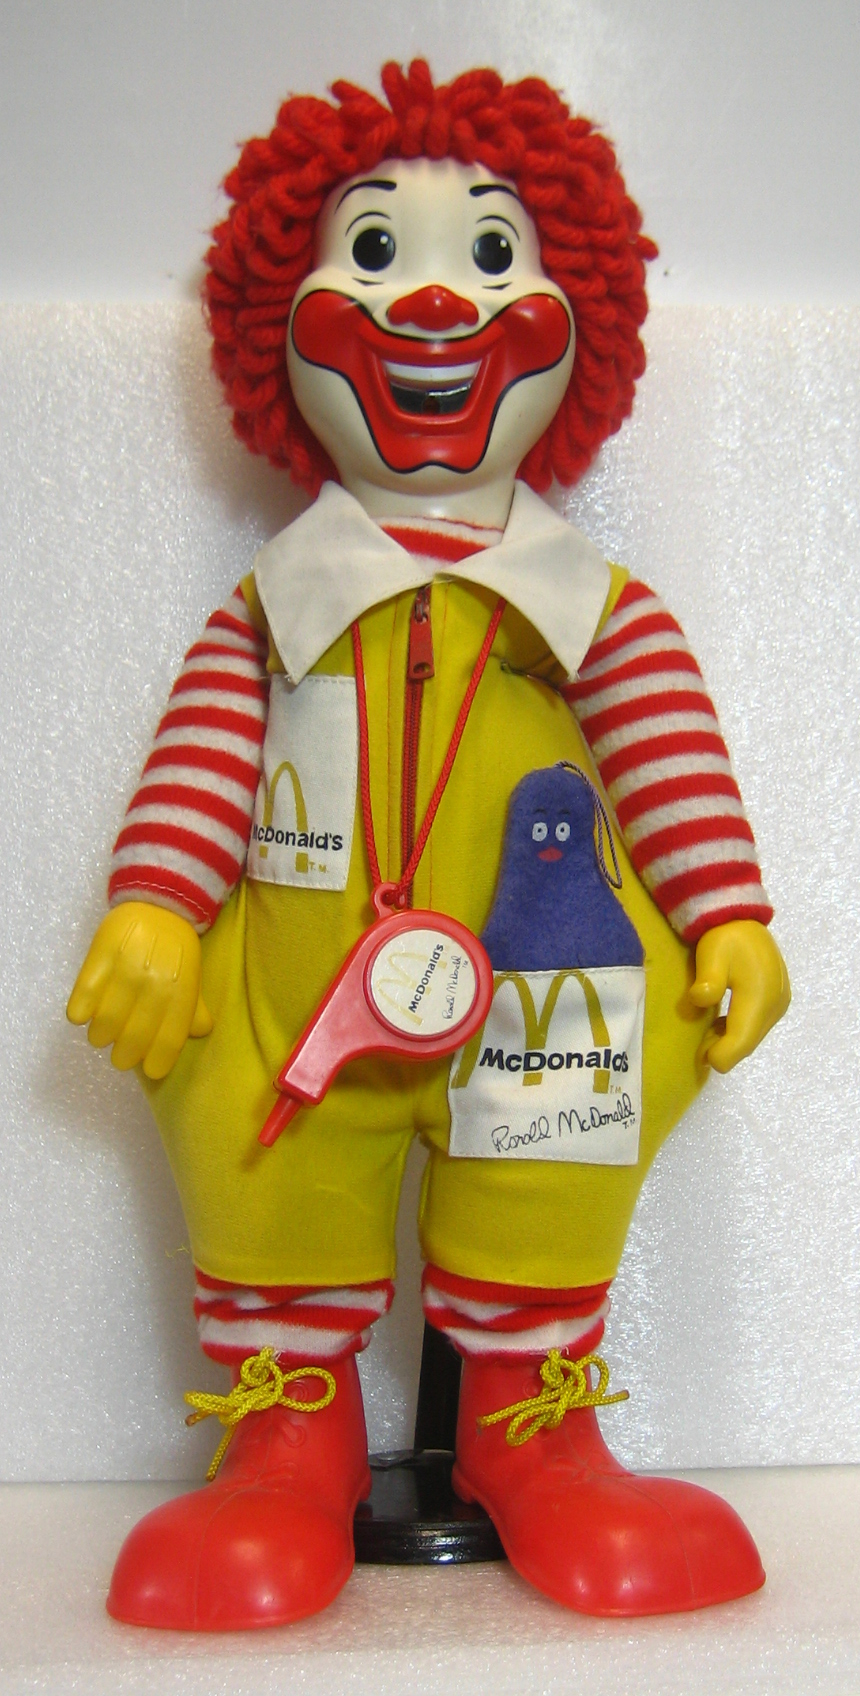 hasbro ronald mcdonald doll 1